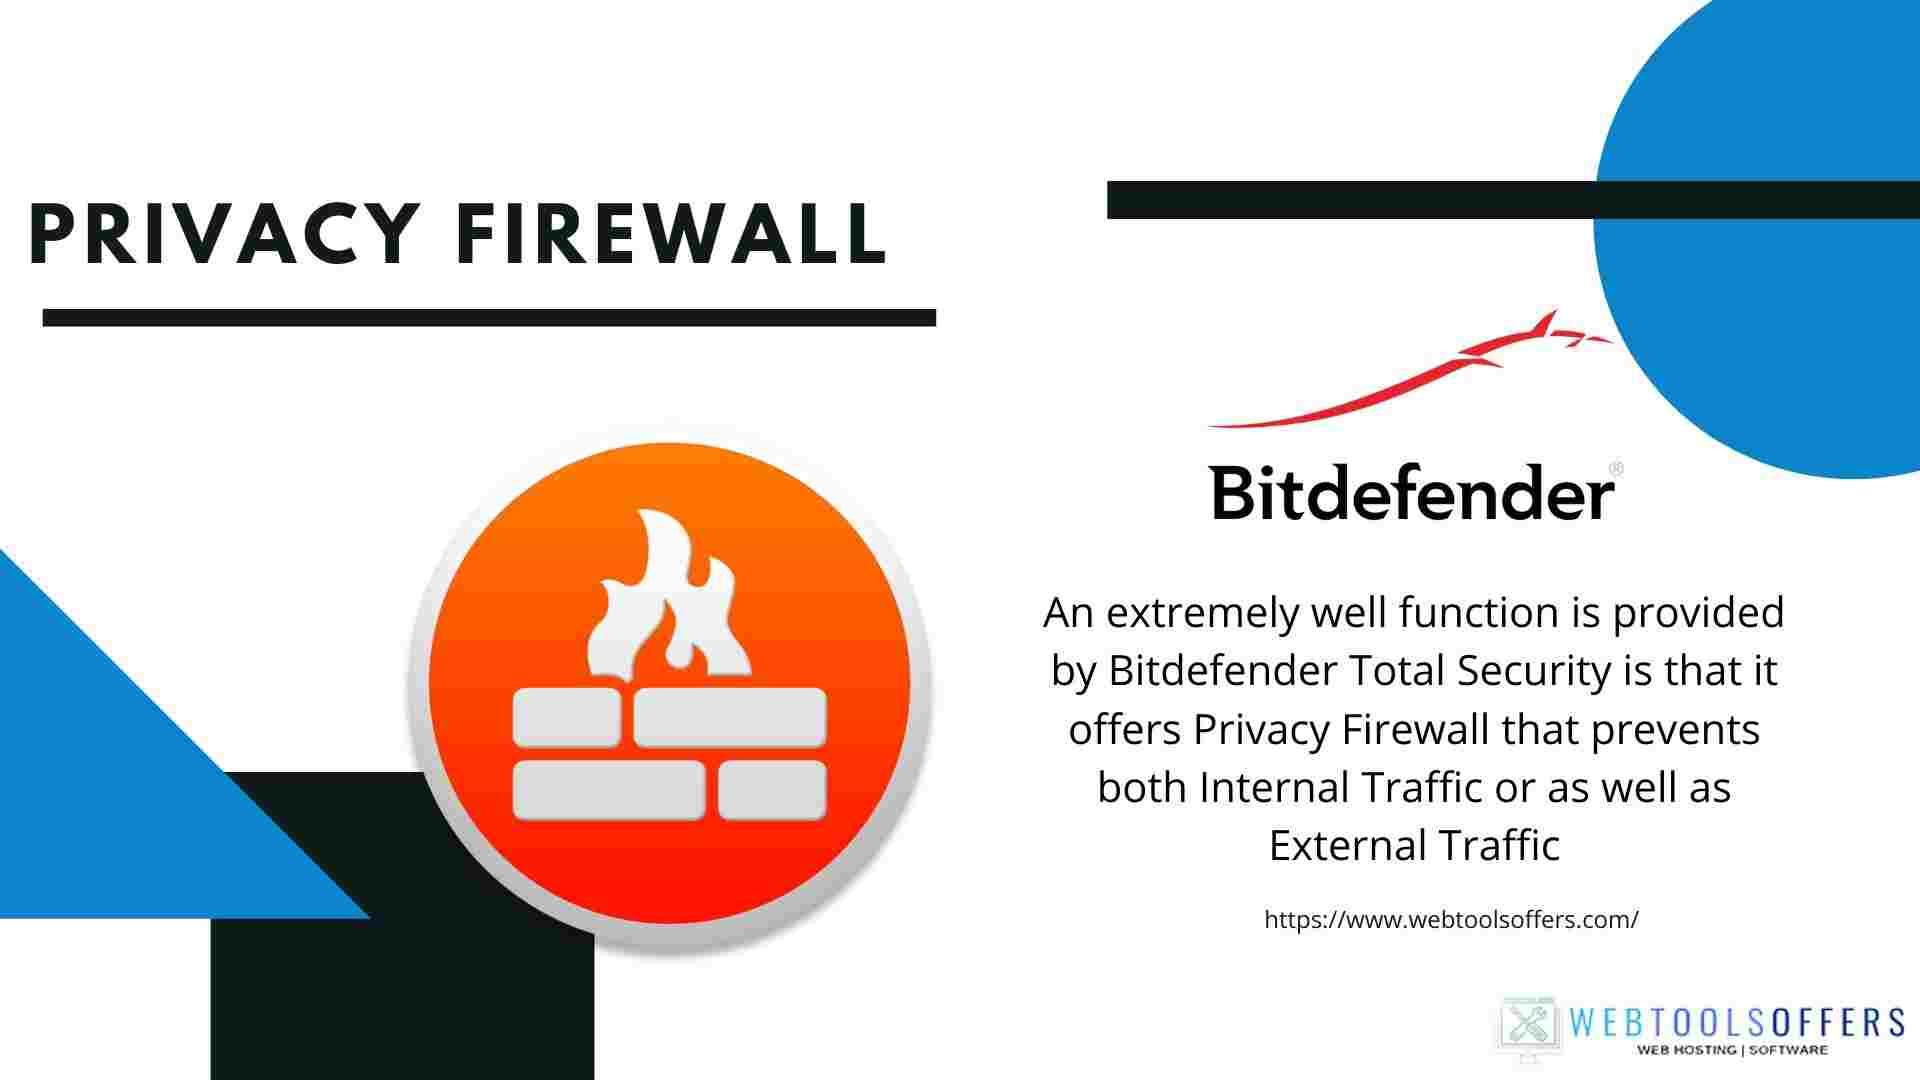 Privacy Firewall